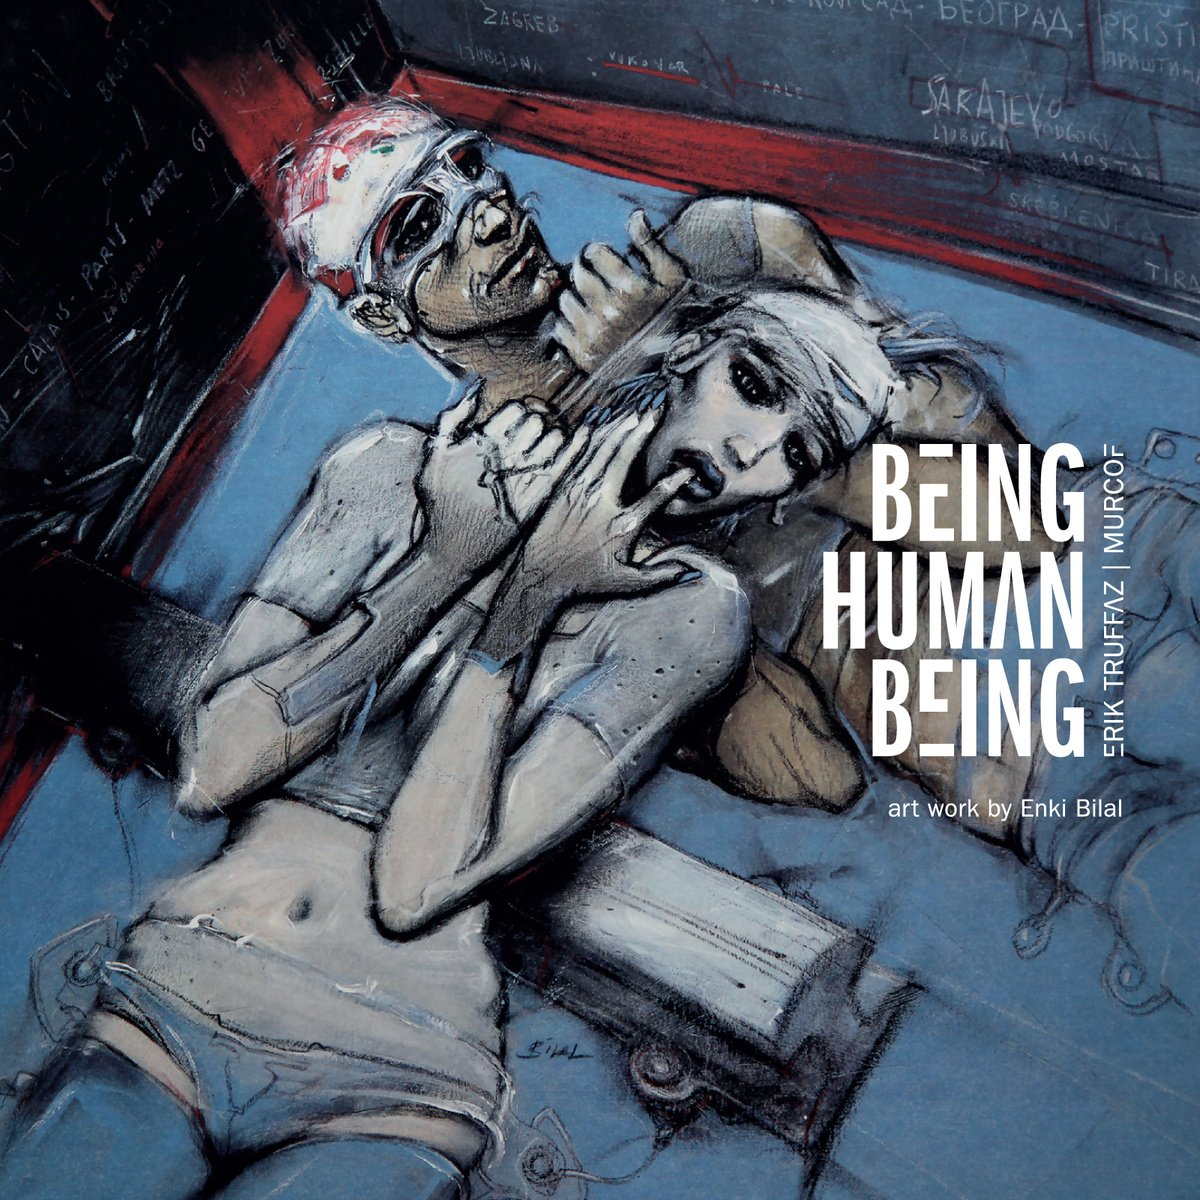 Erik Truffaz & Murcof - Being Human Being (2014)